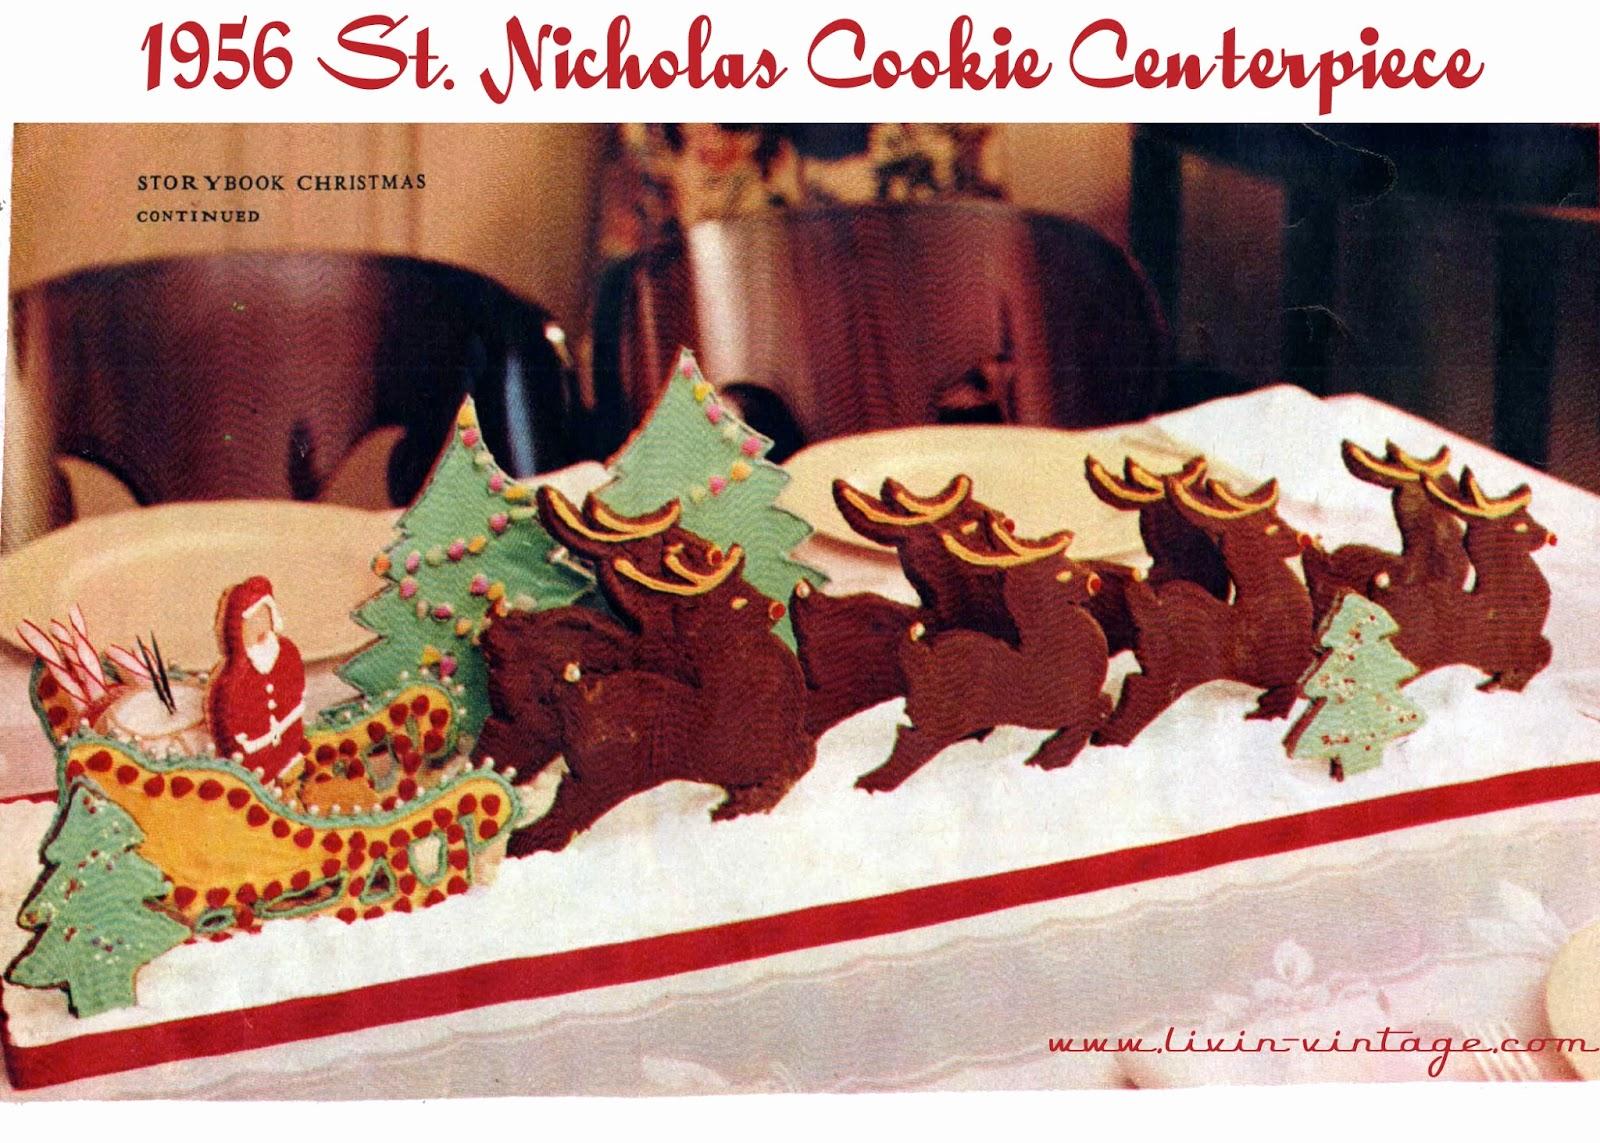 Make A Santa's Sleigh Cookie Centerpiece This Christmas